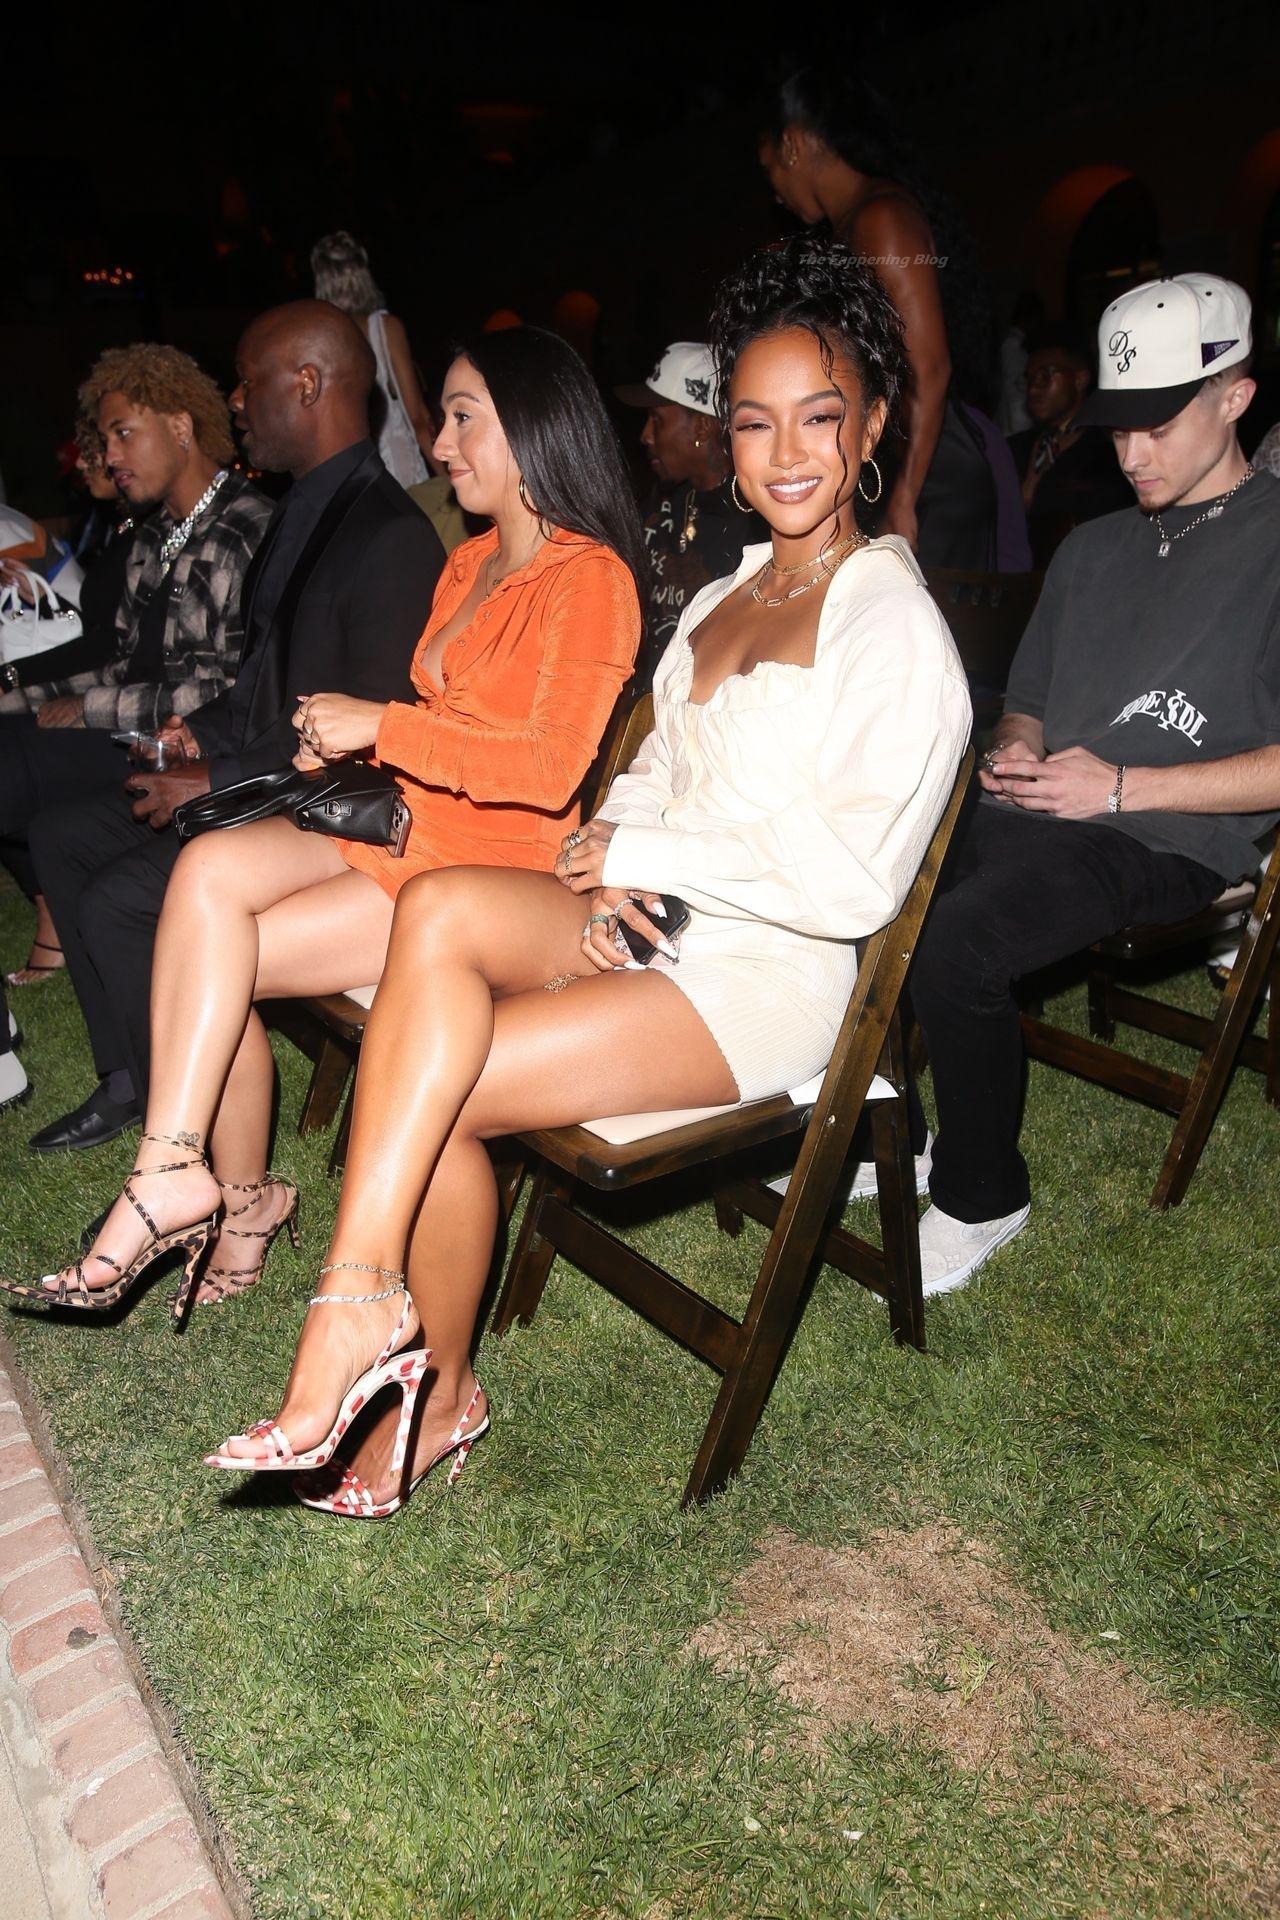 Karrueche-Tran-Sexy-Legs-Feet-The-Fappening-Blog-33-.jpg